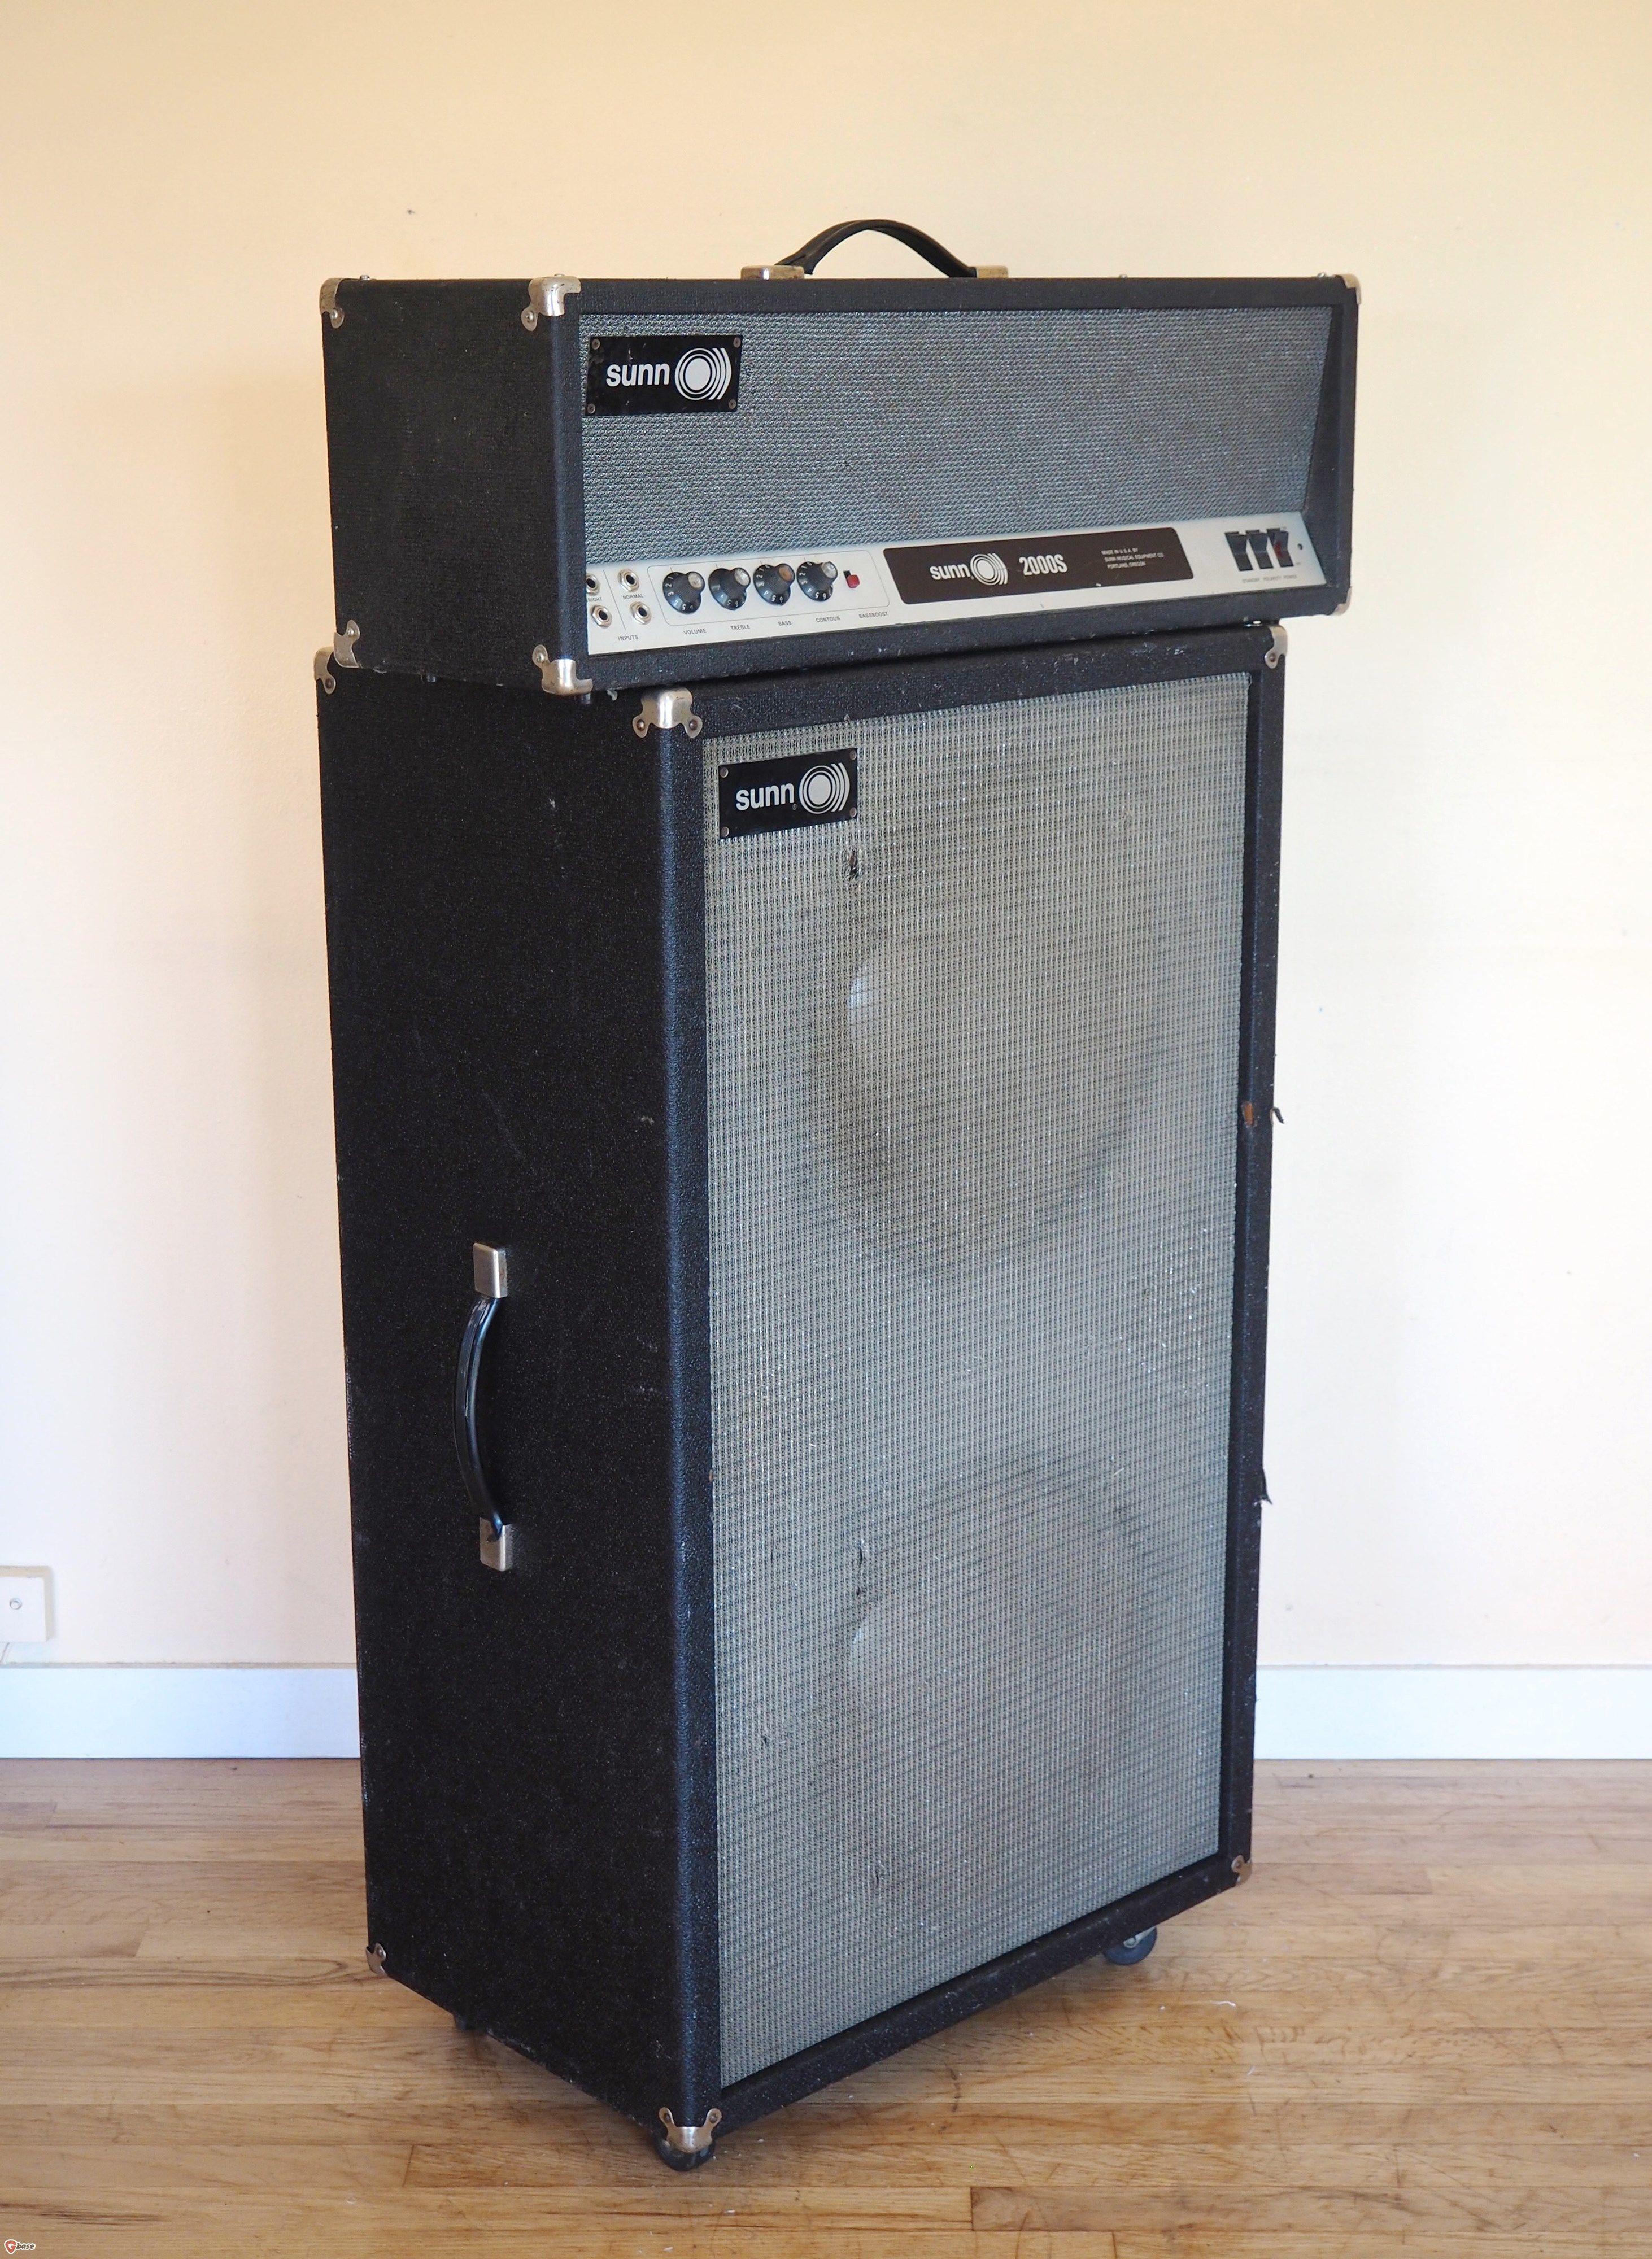 Up for sale, a 1969 Sunn 2000S vintage tube bass amplifier